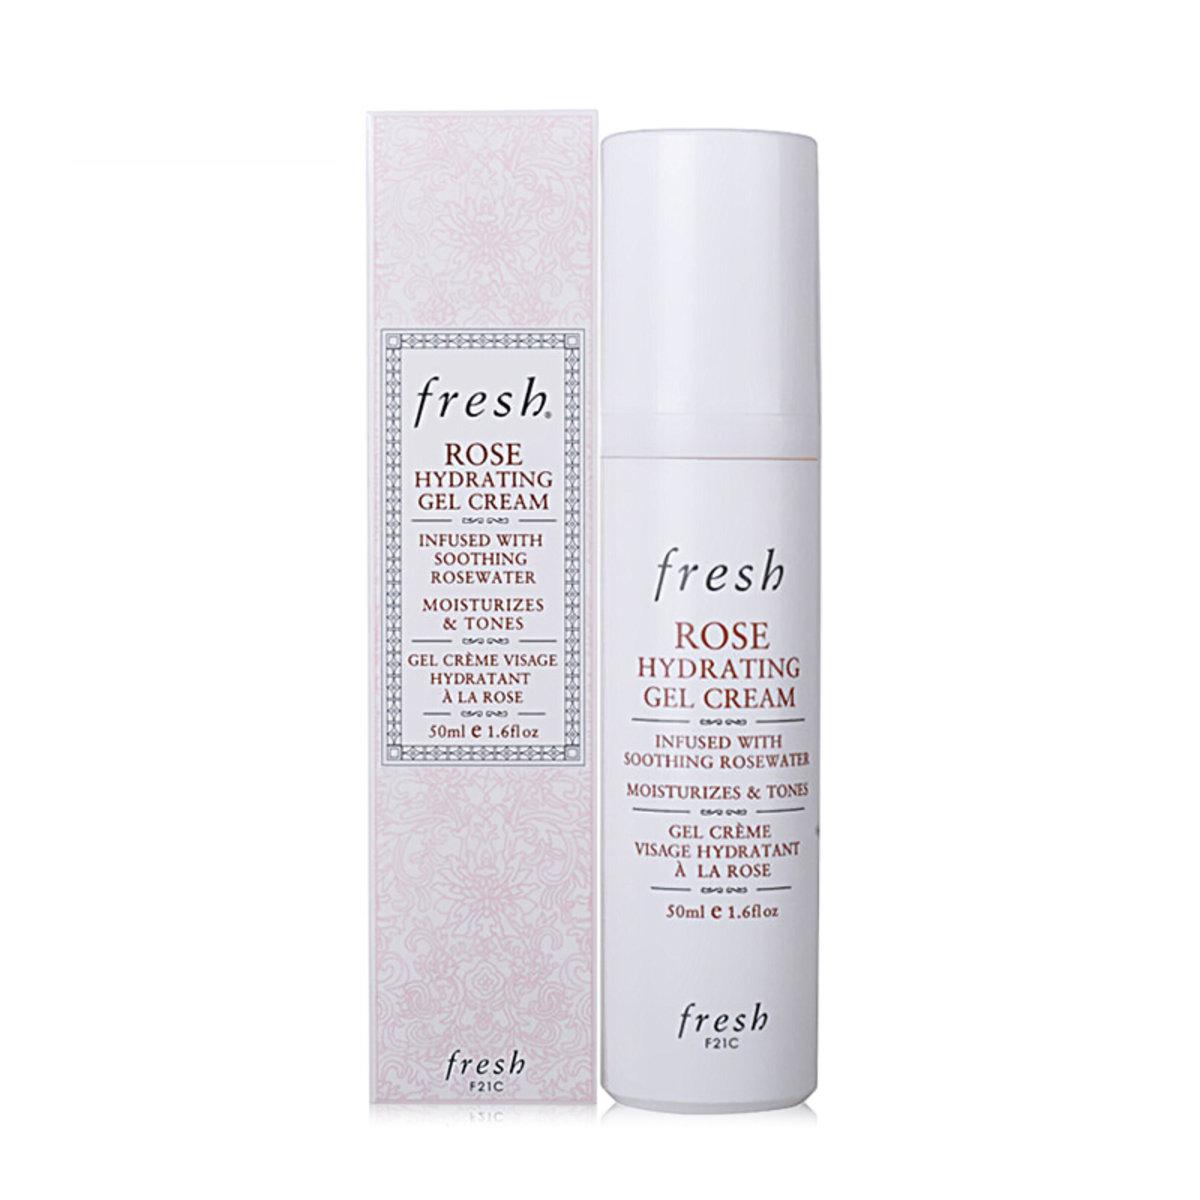 Rose Hydrating Gel Cream 50ML(Parallel Import)